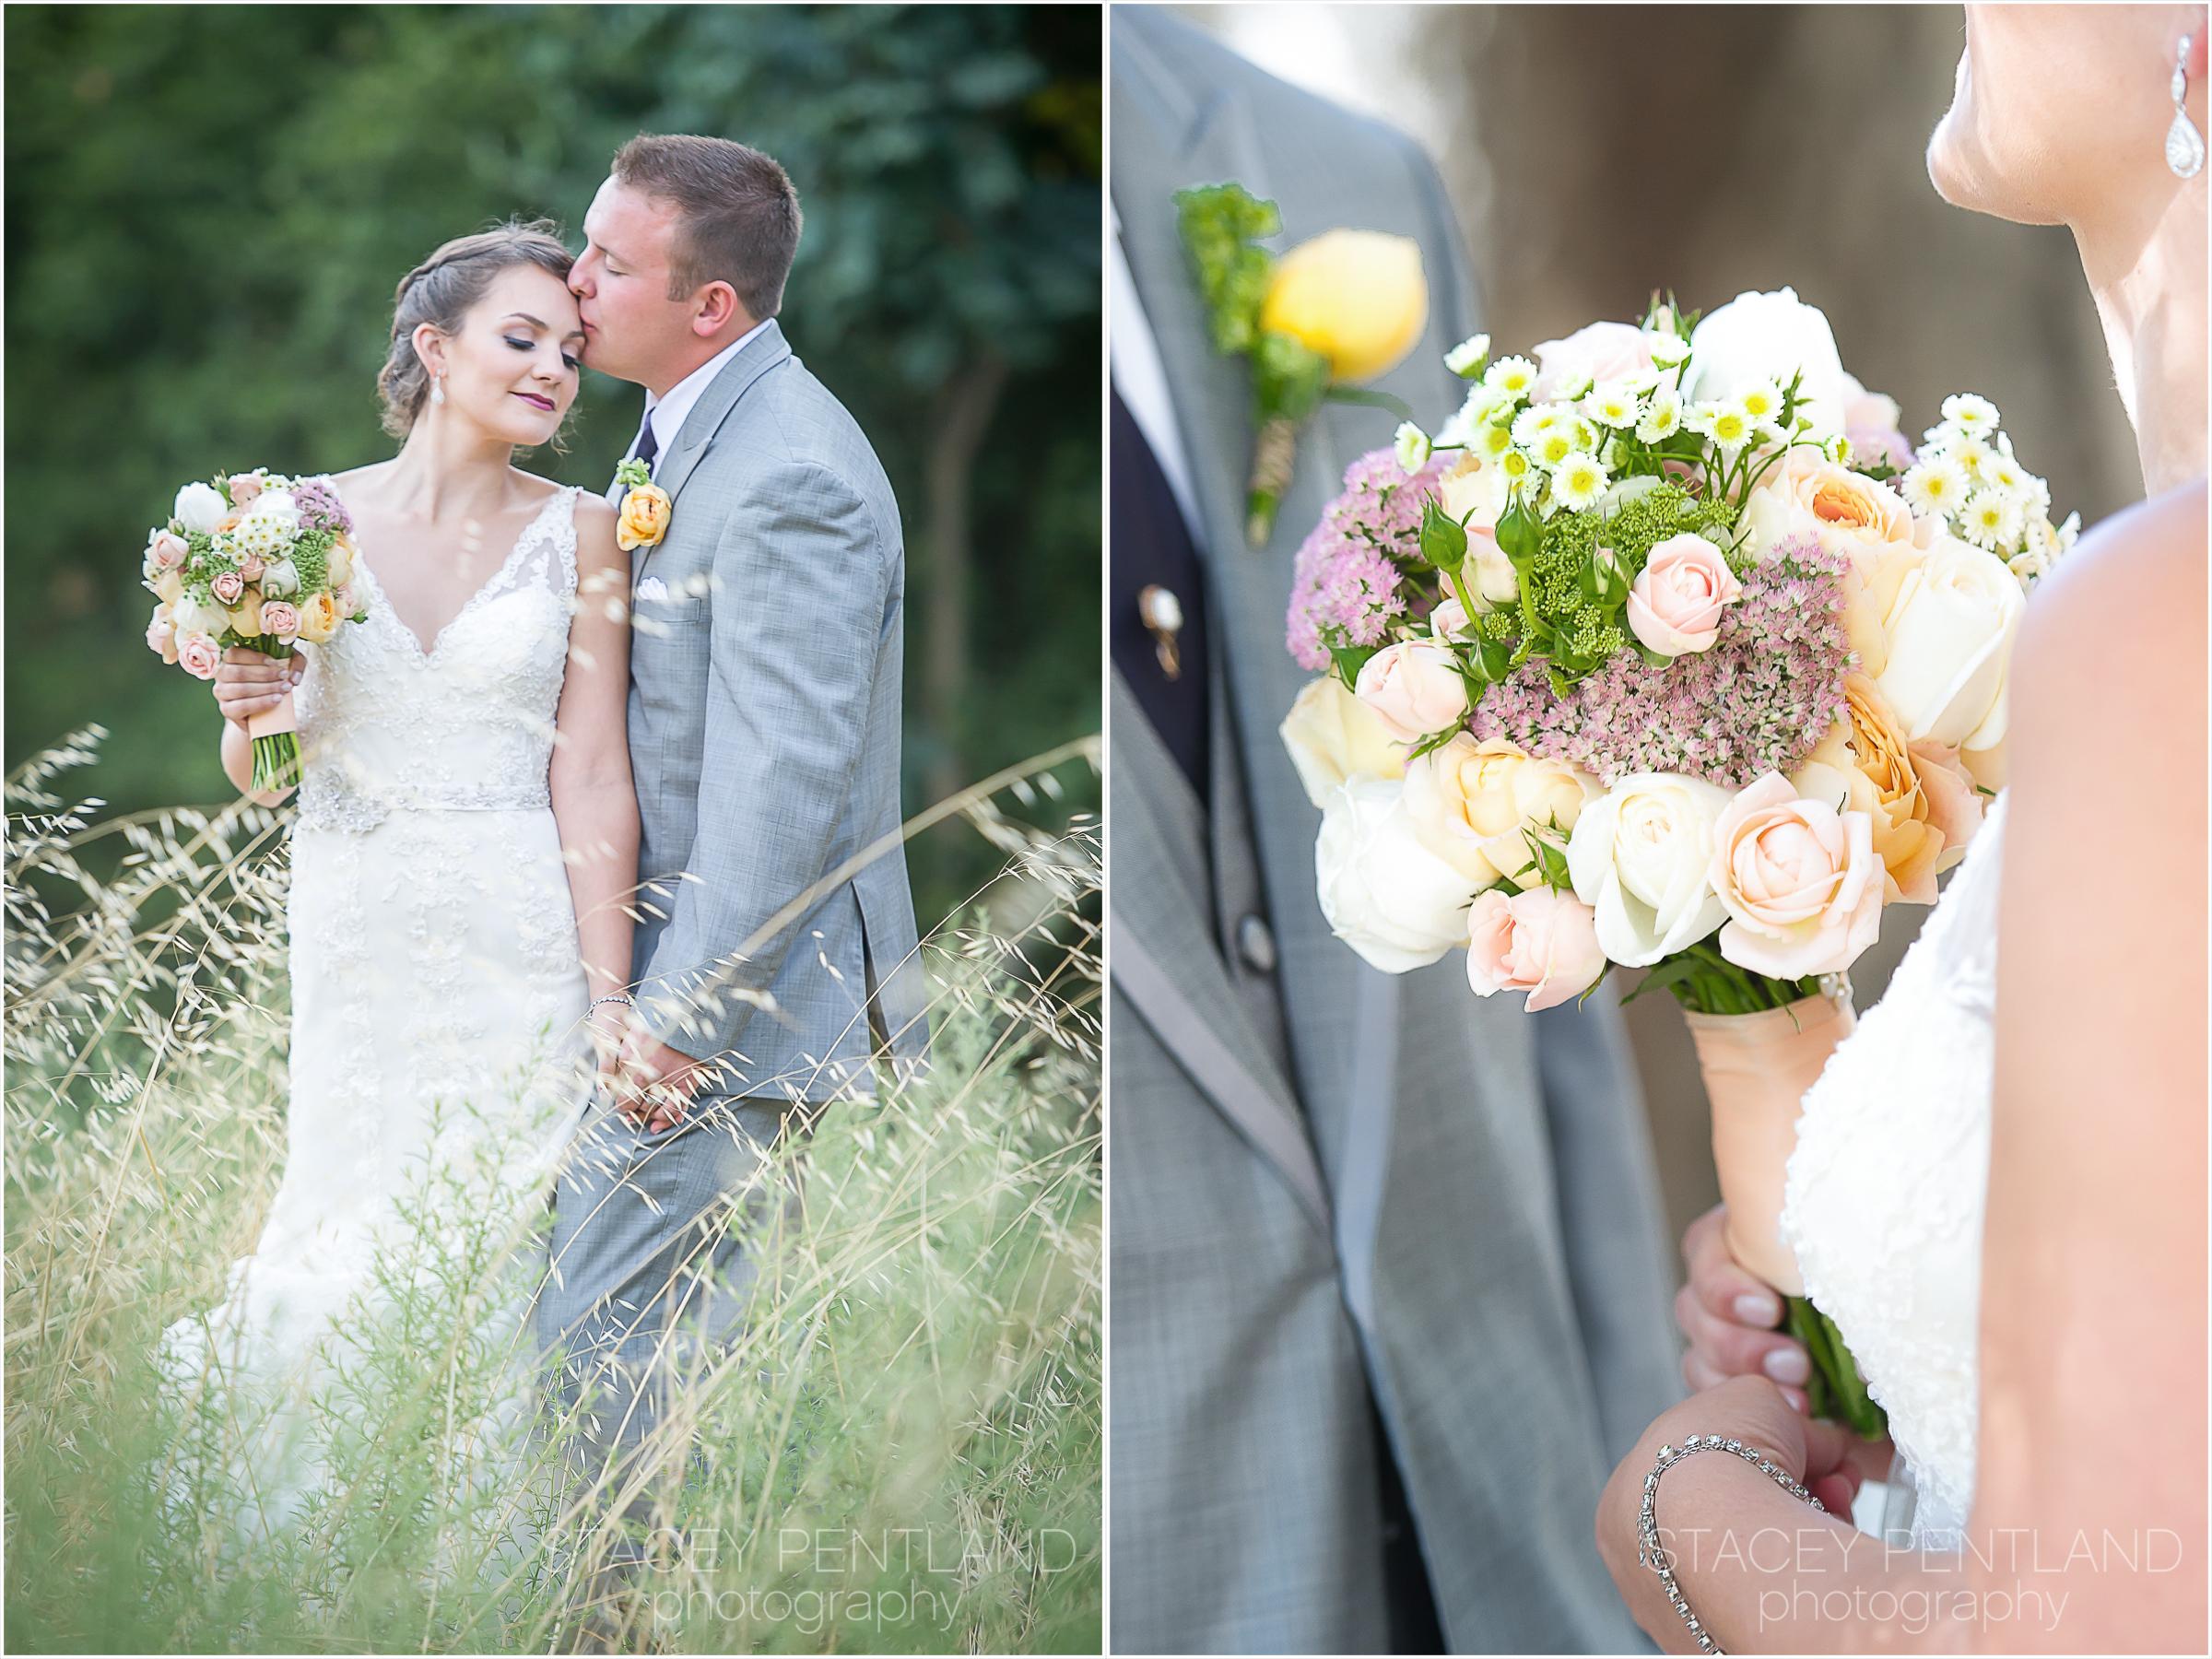 whitney+matthew_wedding-001.jpg